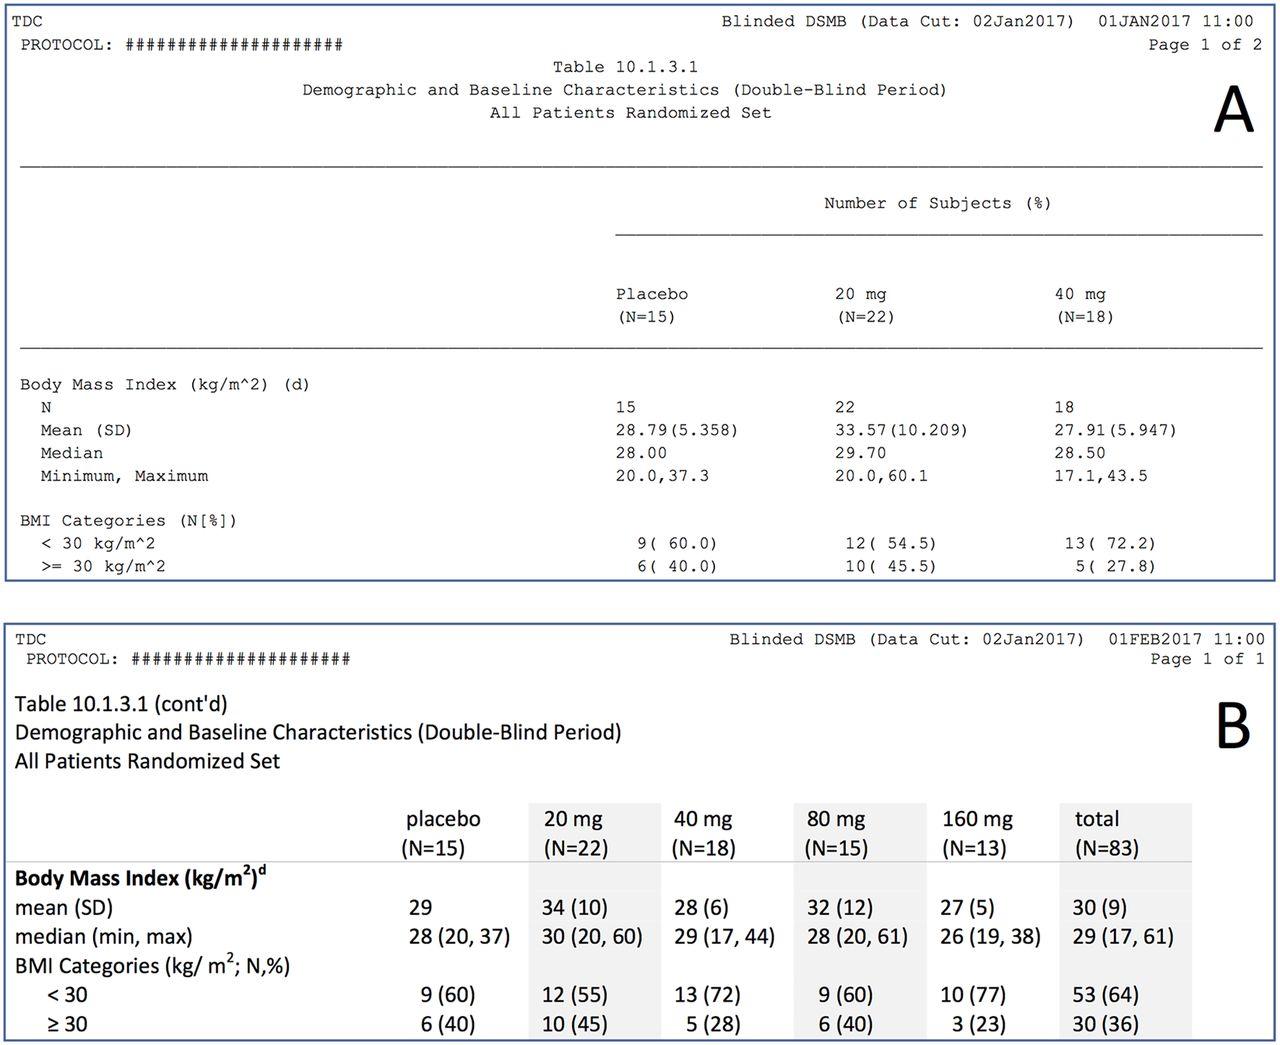 cognos 11 split report pdf many pages